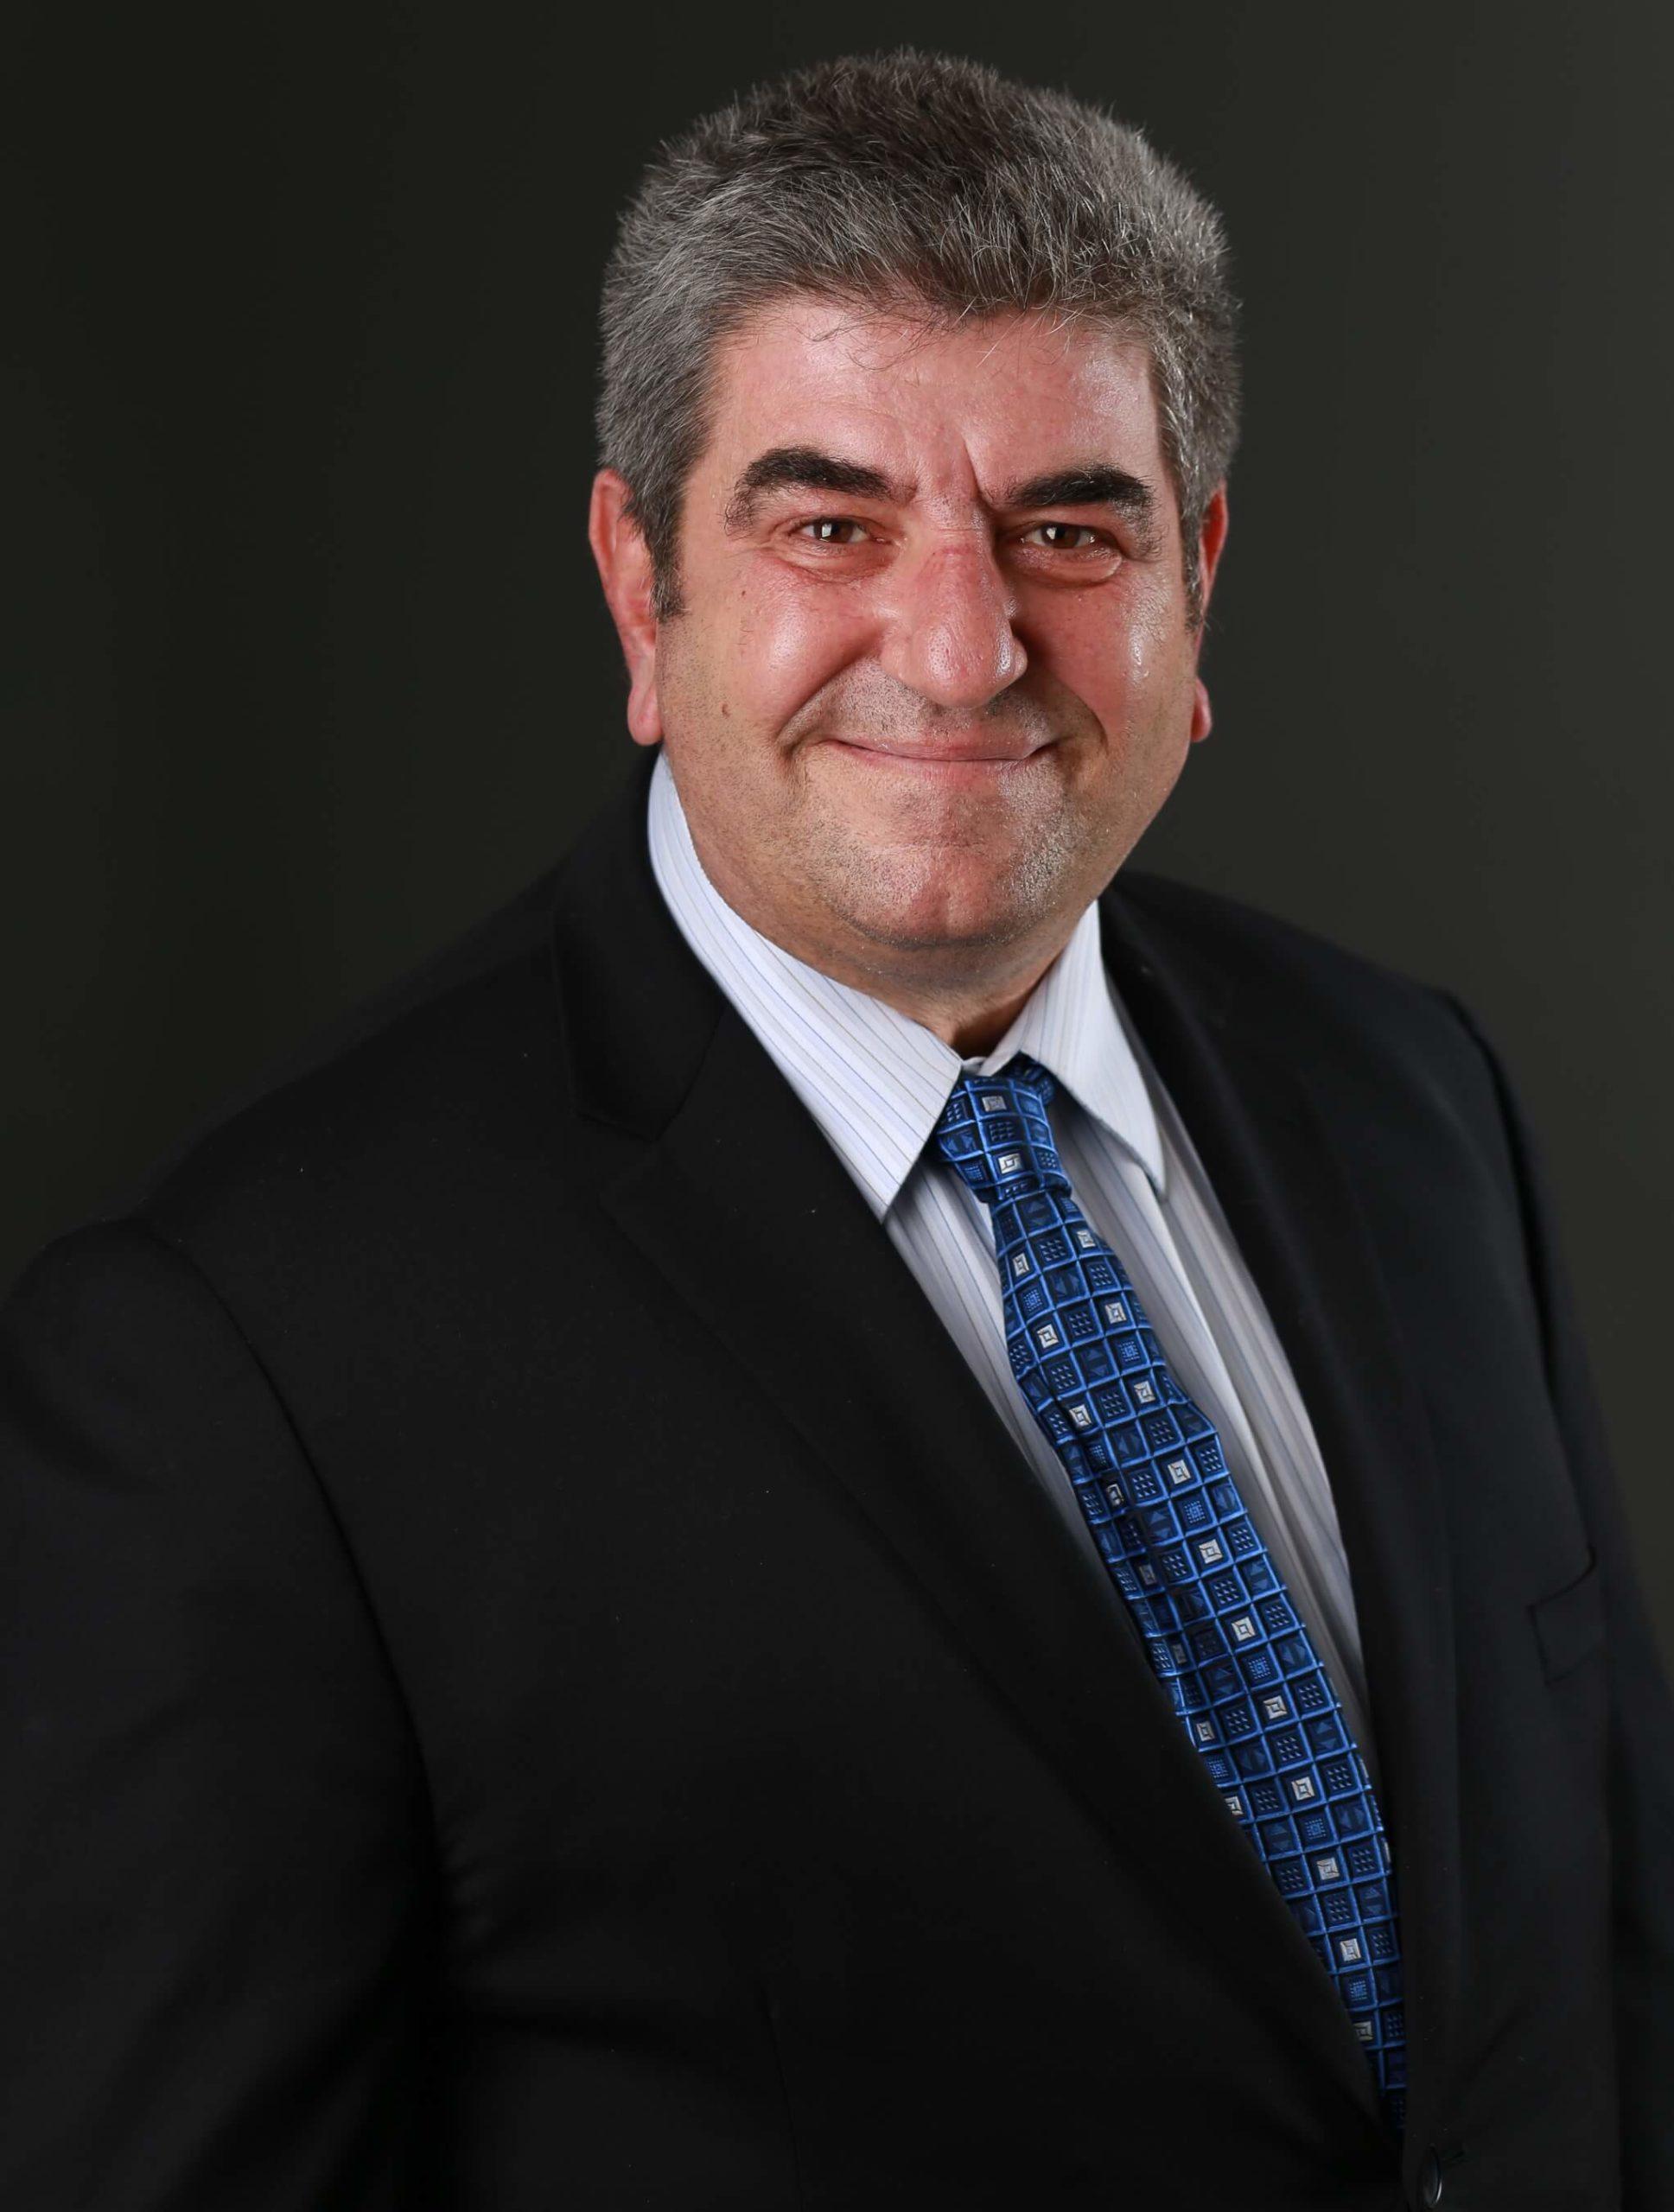 Demetrios Liakopoulos